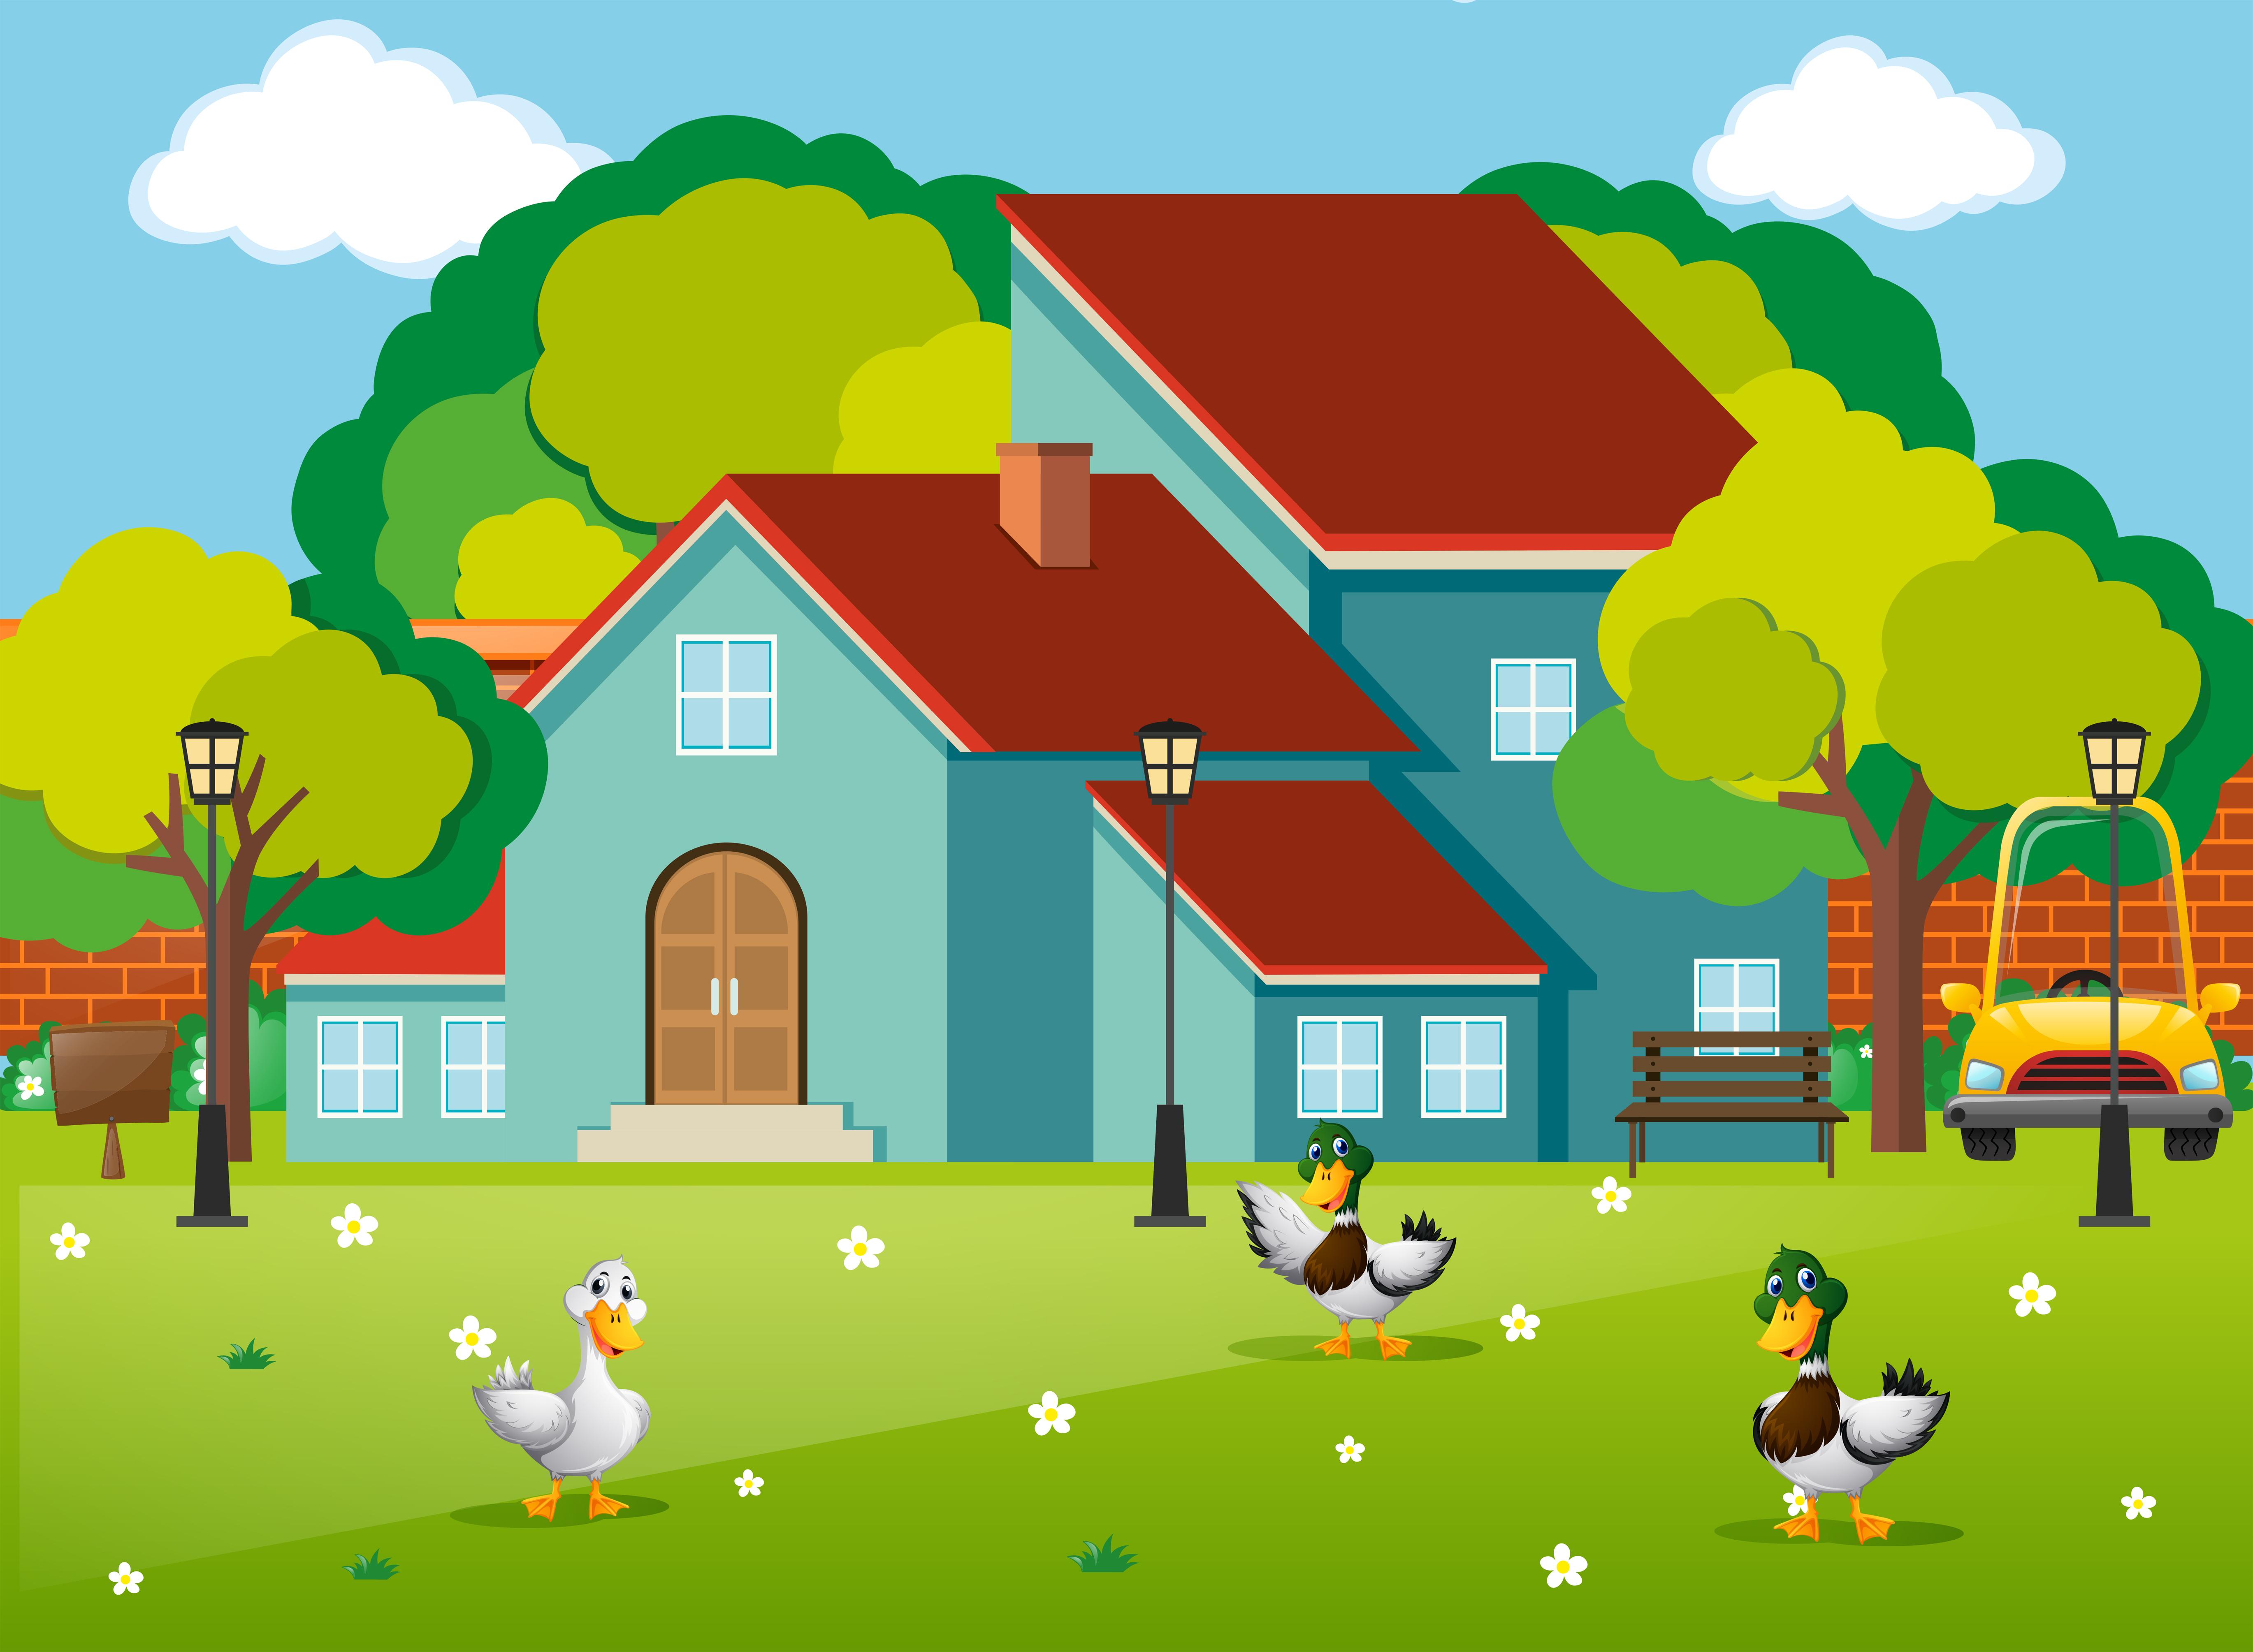 Three Ducks In The Front Yard Download Free Vectors Clipart Graphics Vector Art